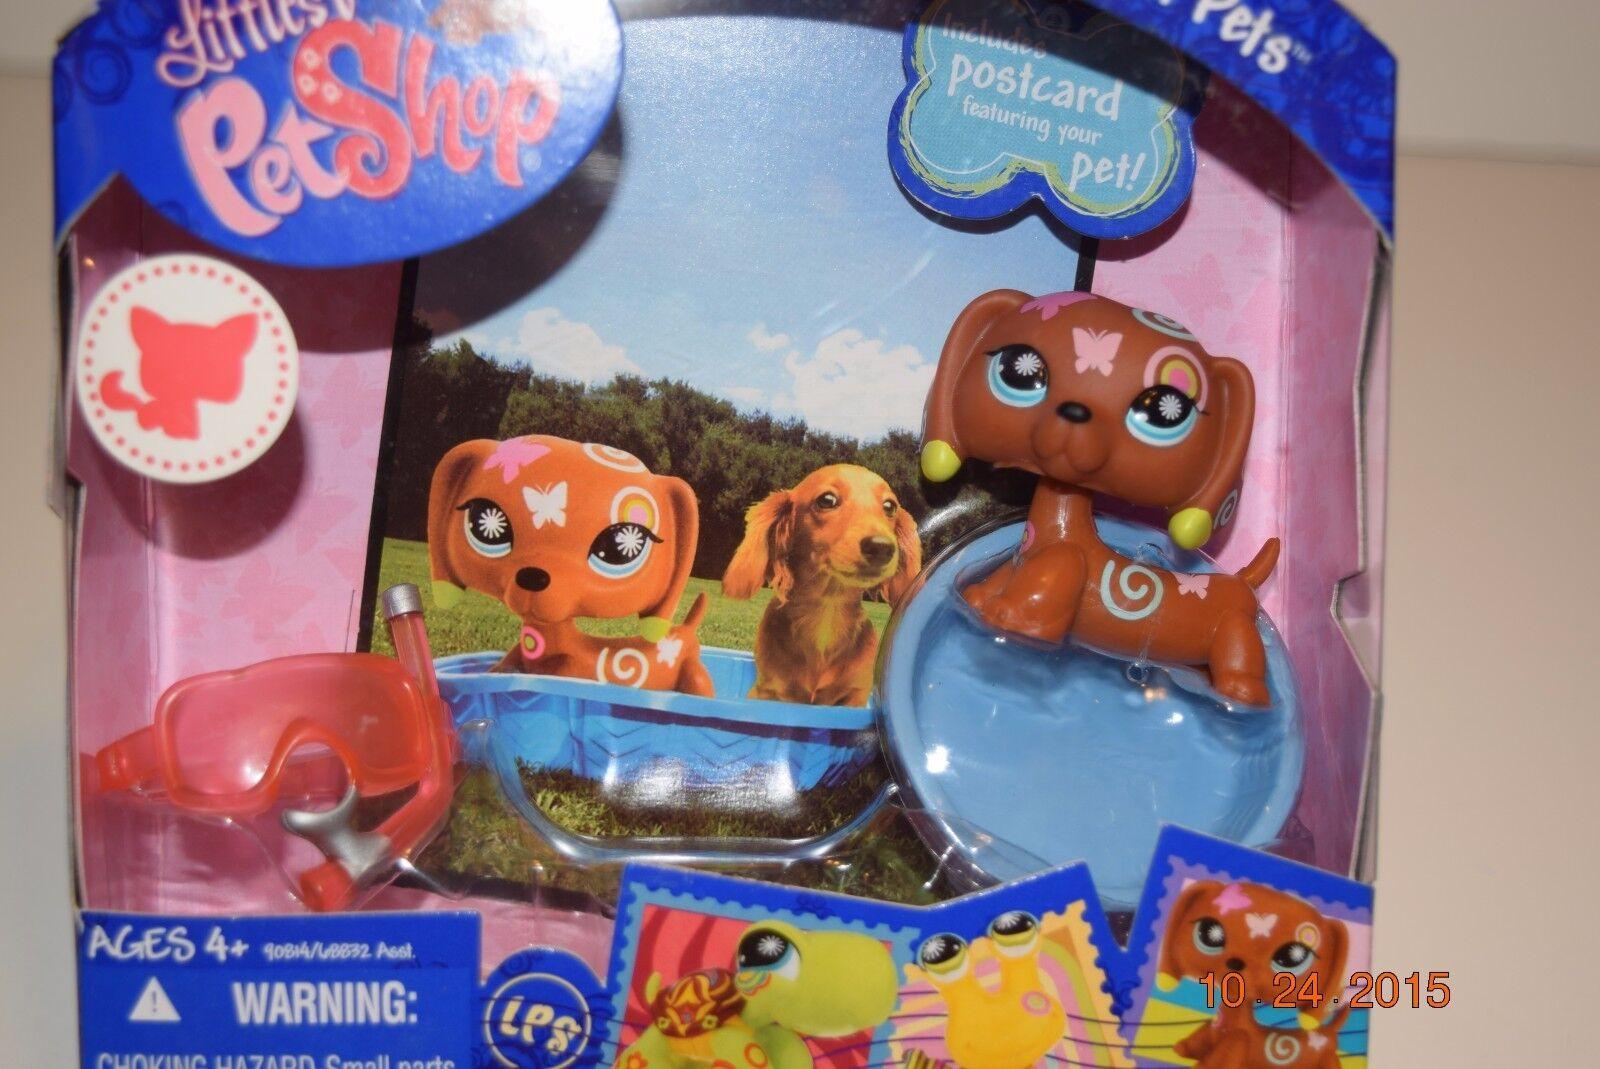 Littlest Pet Shop Postcard Pet DACHSHUND , Age 4+, HTF, VERY RARE, NIP